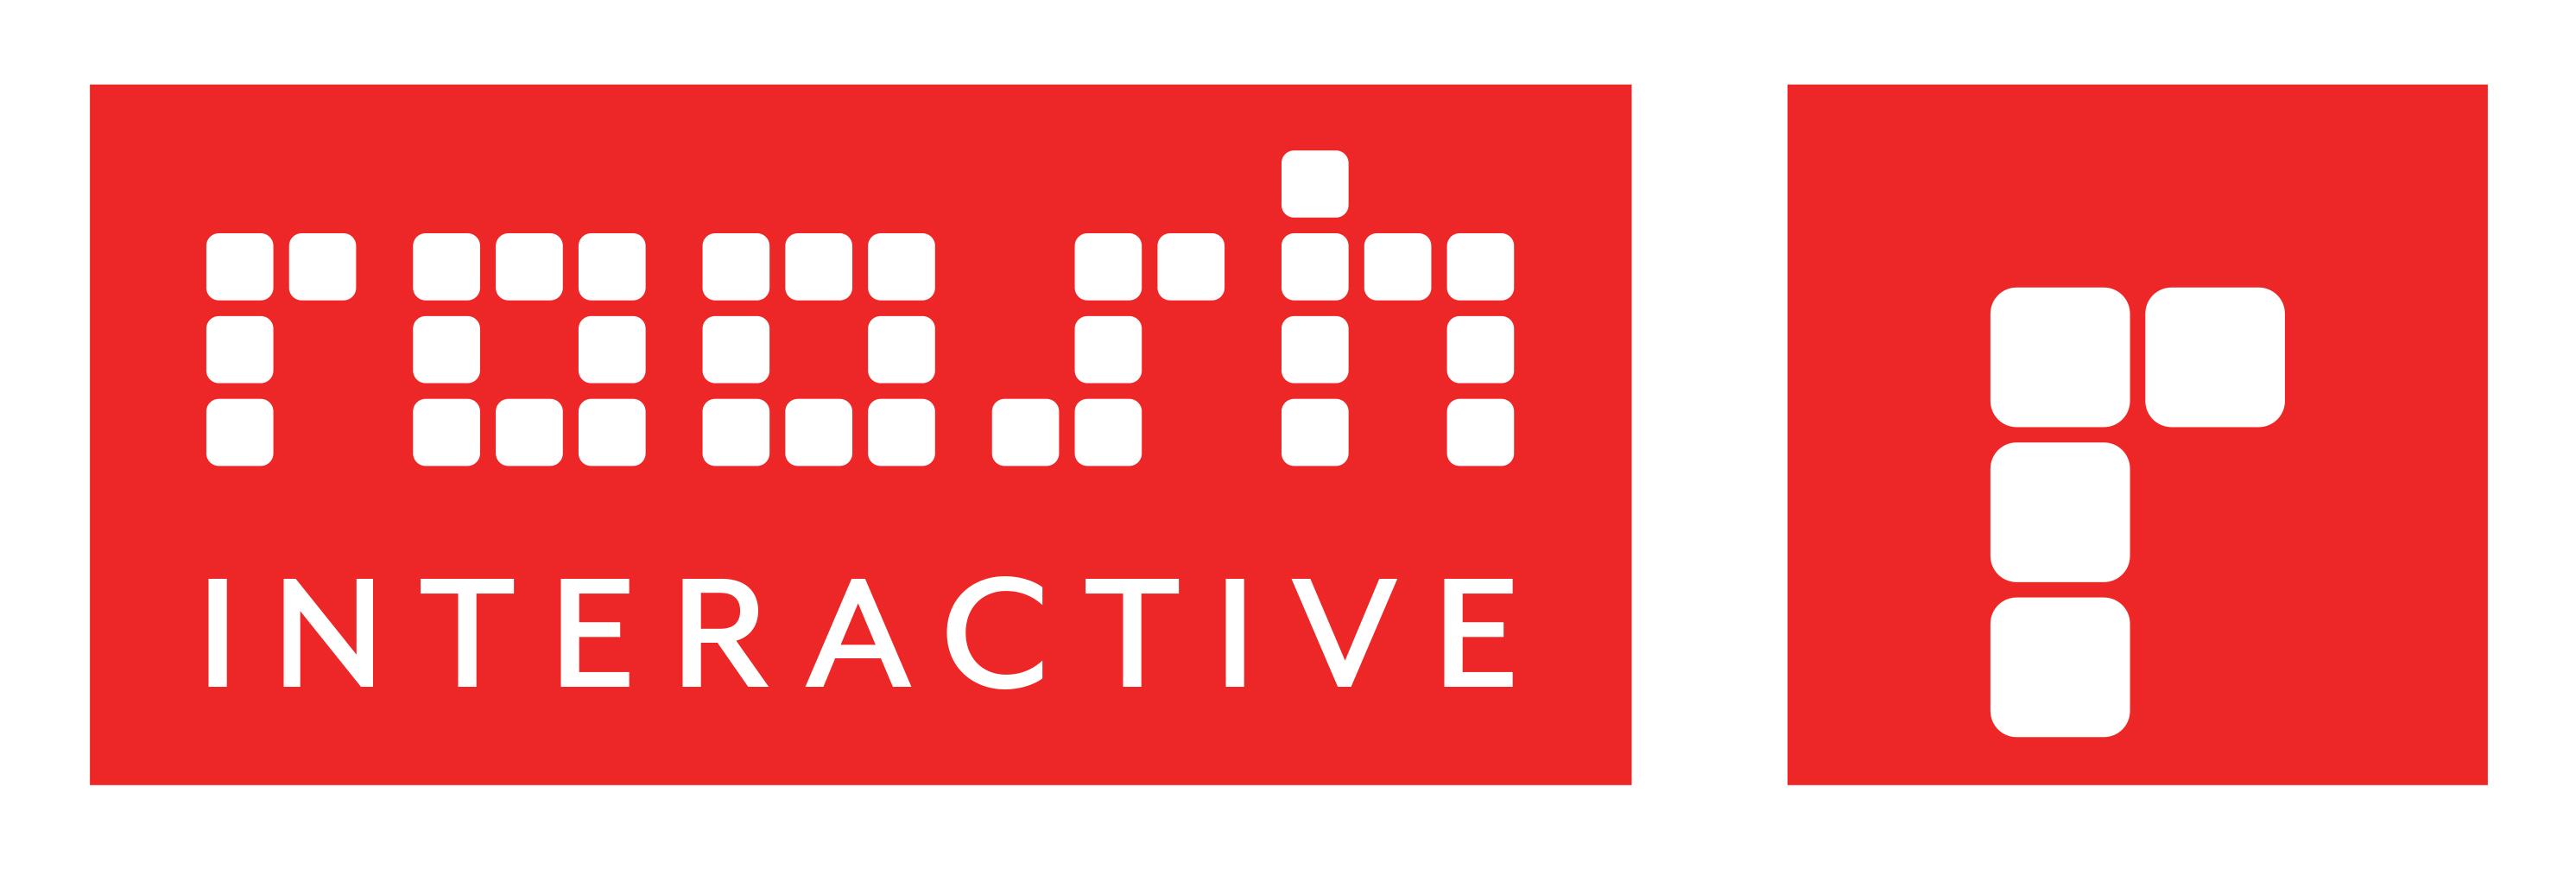 Logo Design by Martyn Jones - Entry No. 80 in the Logo Design Contest Creative Logo Design for a Gaming company.